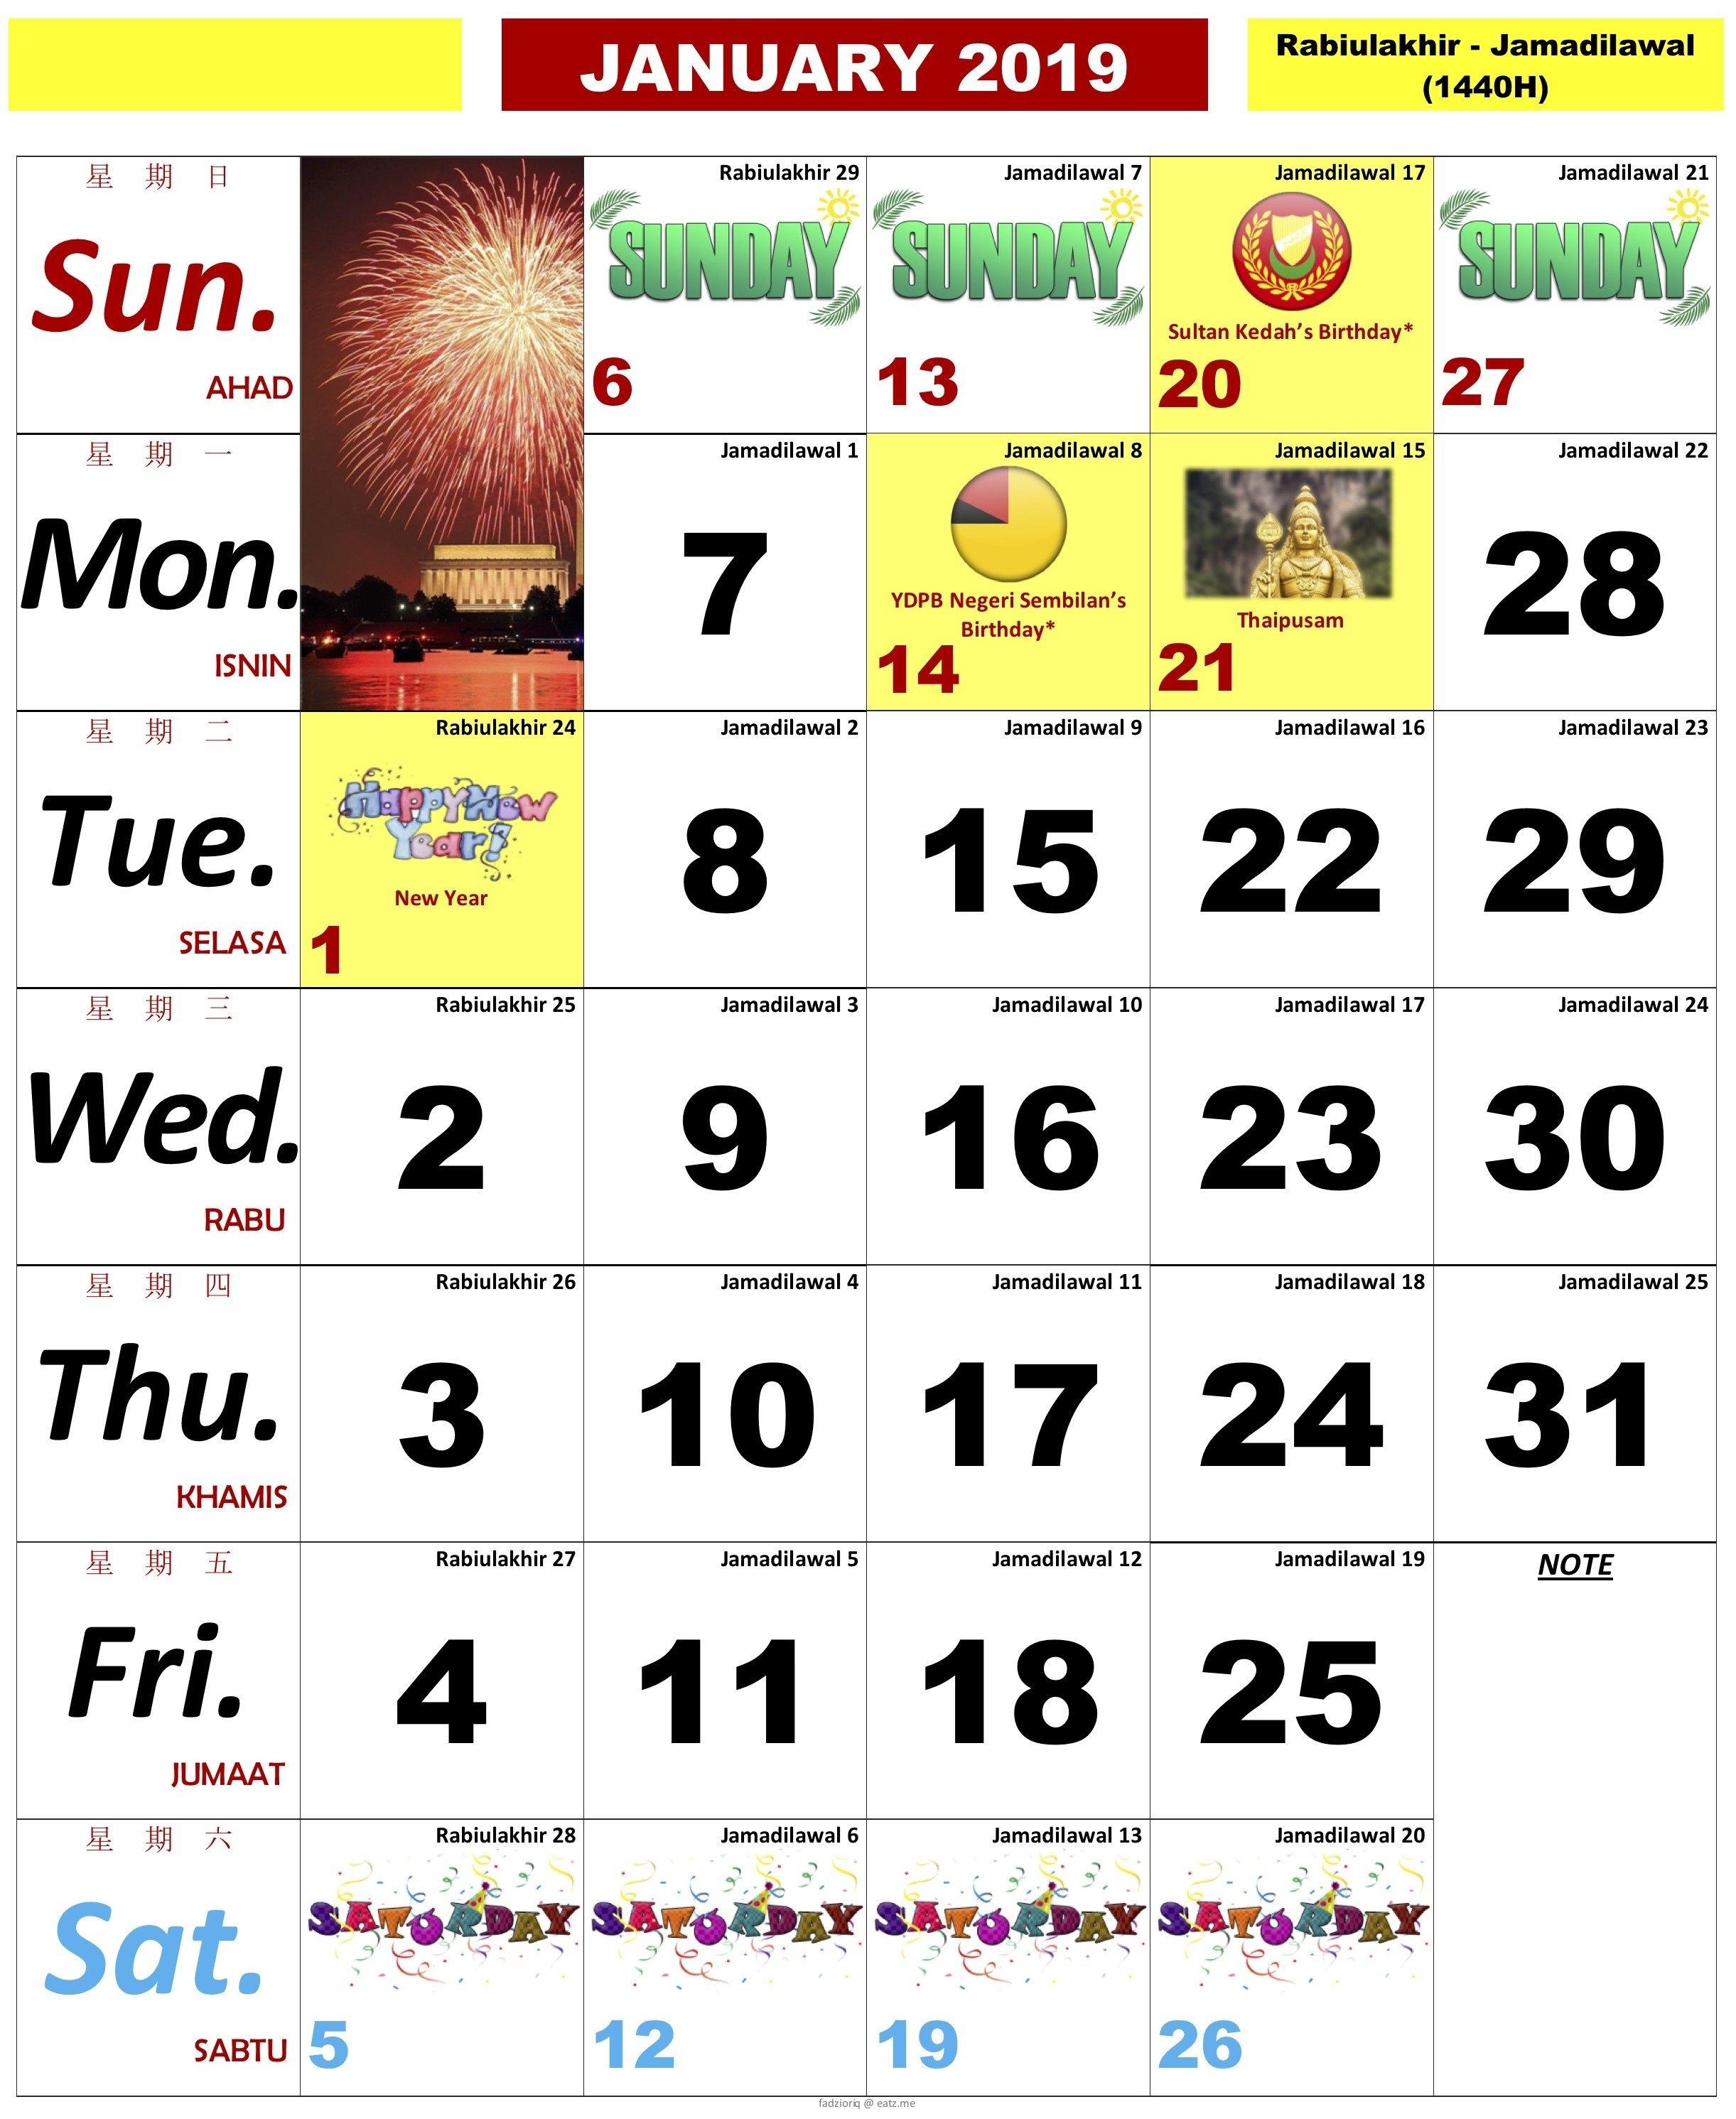 Information Regarding Kalendar Kuda 2019 Malaysia Pdf - Calendar Calendar 2019 Kuda Pdf